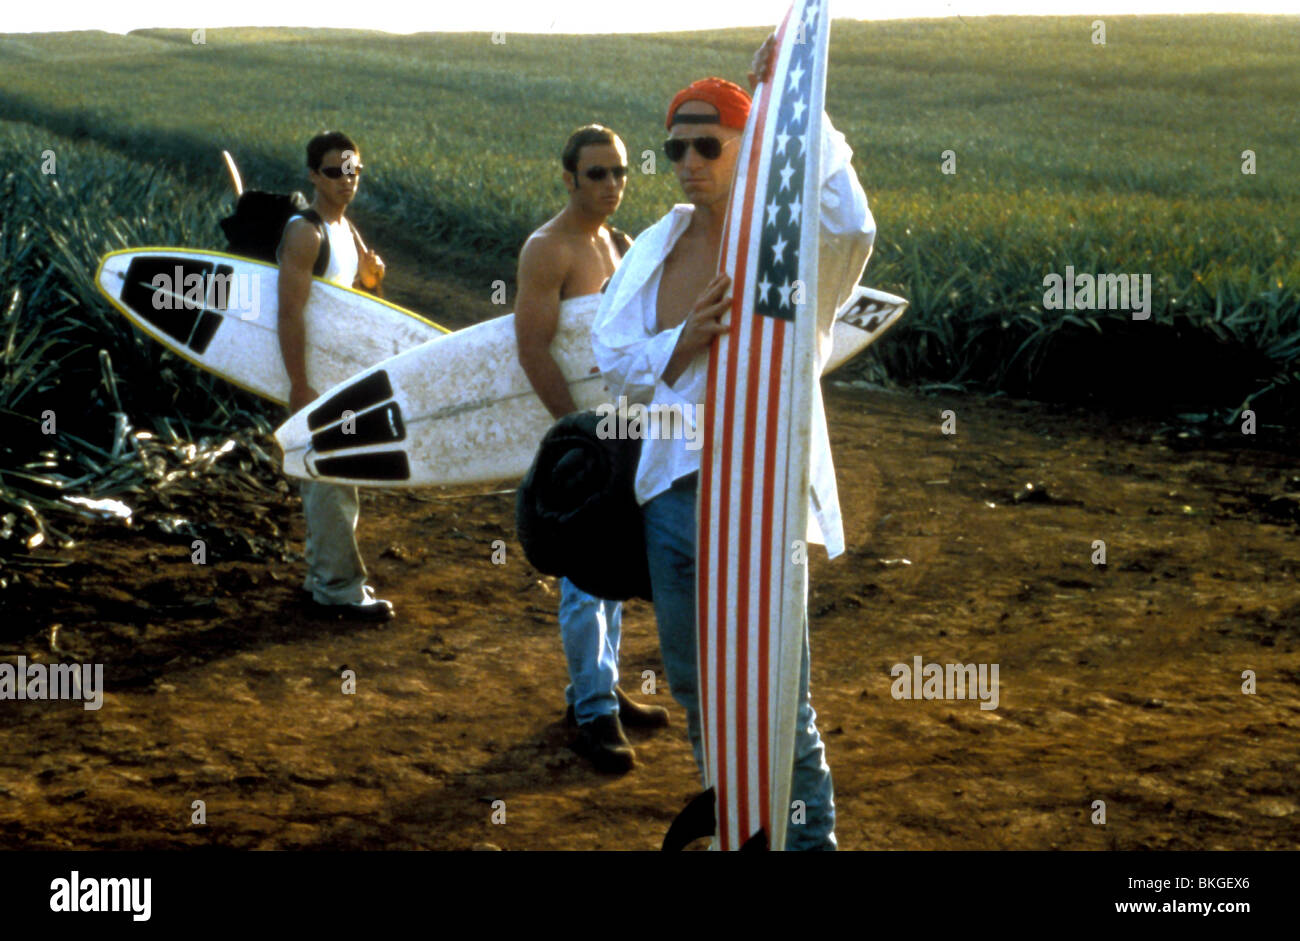 IN GOD'S HANDS (1998) MATTHEW STEPHEN LIU, SHANE DORIAN, MATT GEORGE IGHS 029 - Stock Image